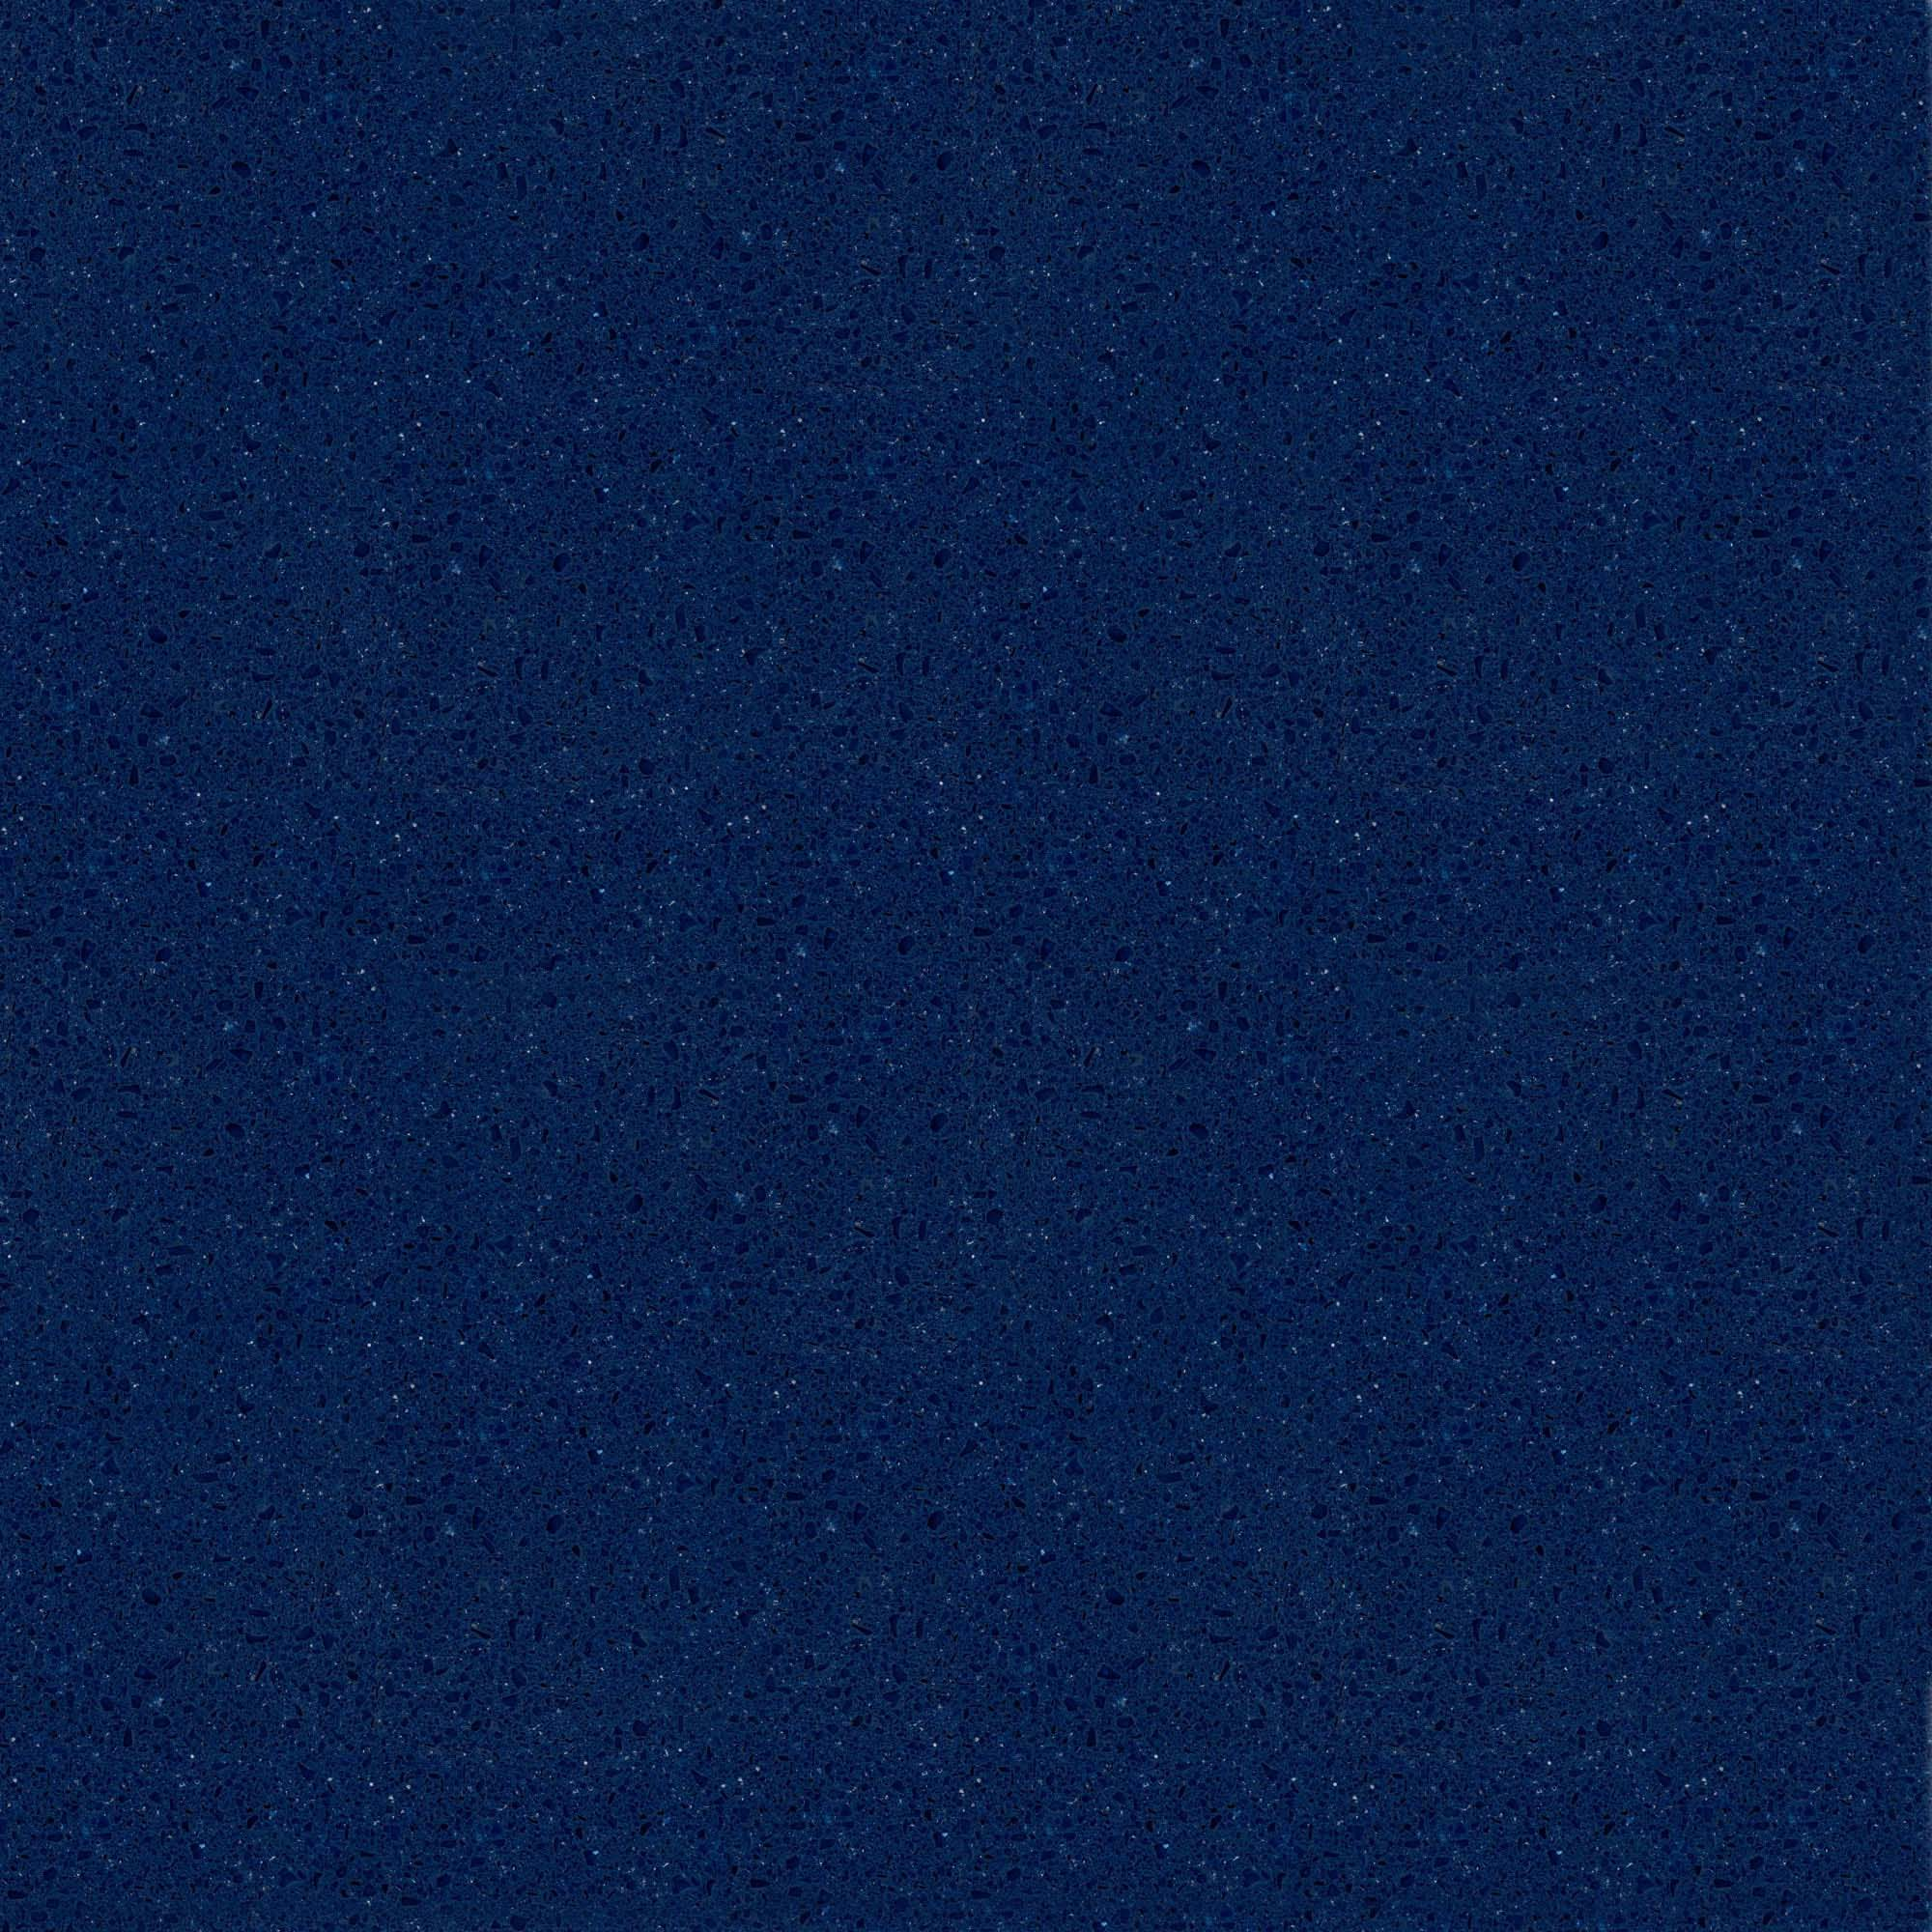 Ref 461 Night Blue